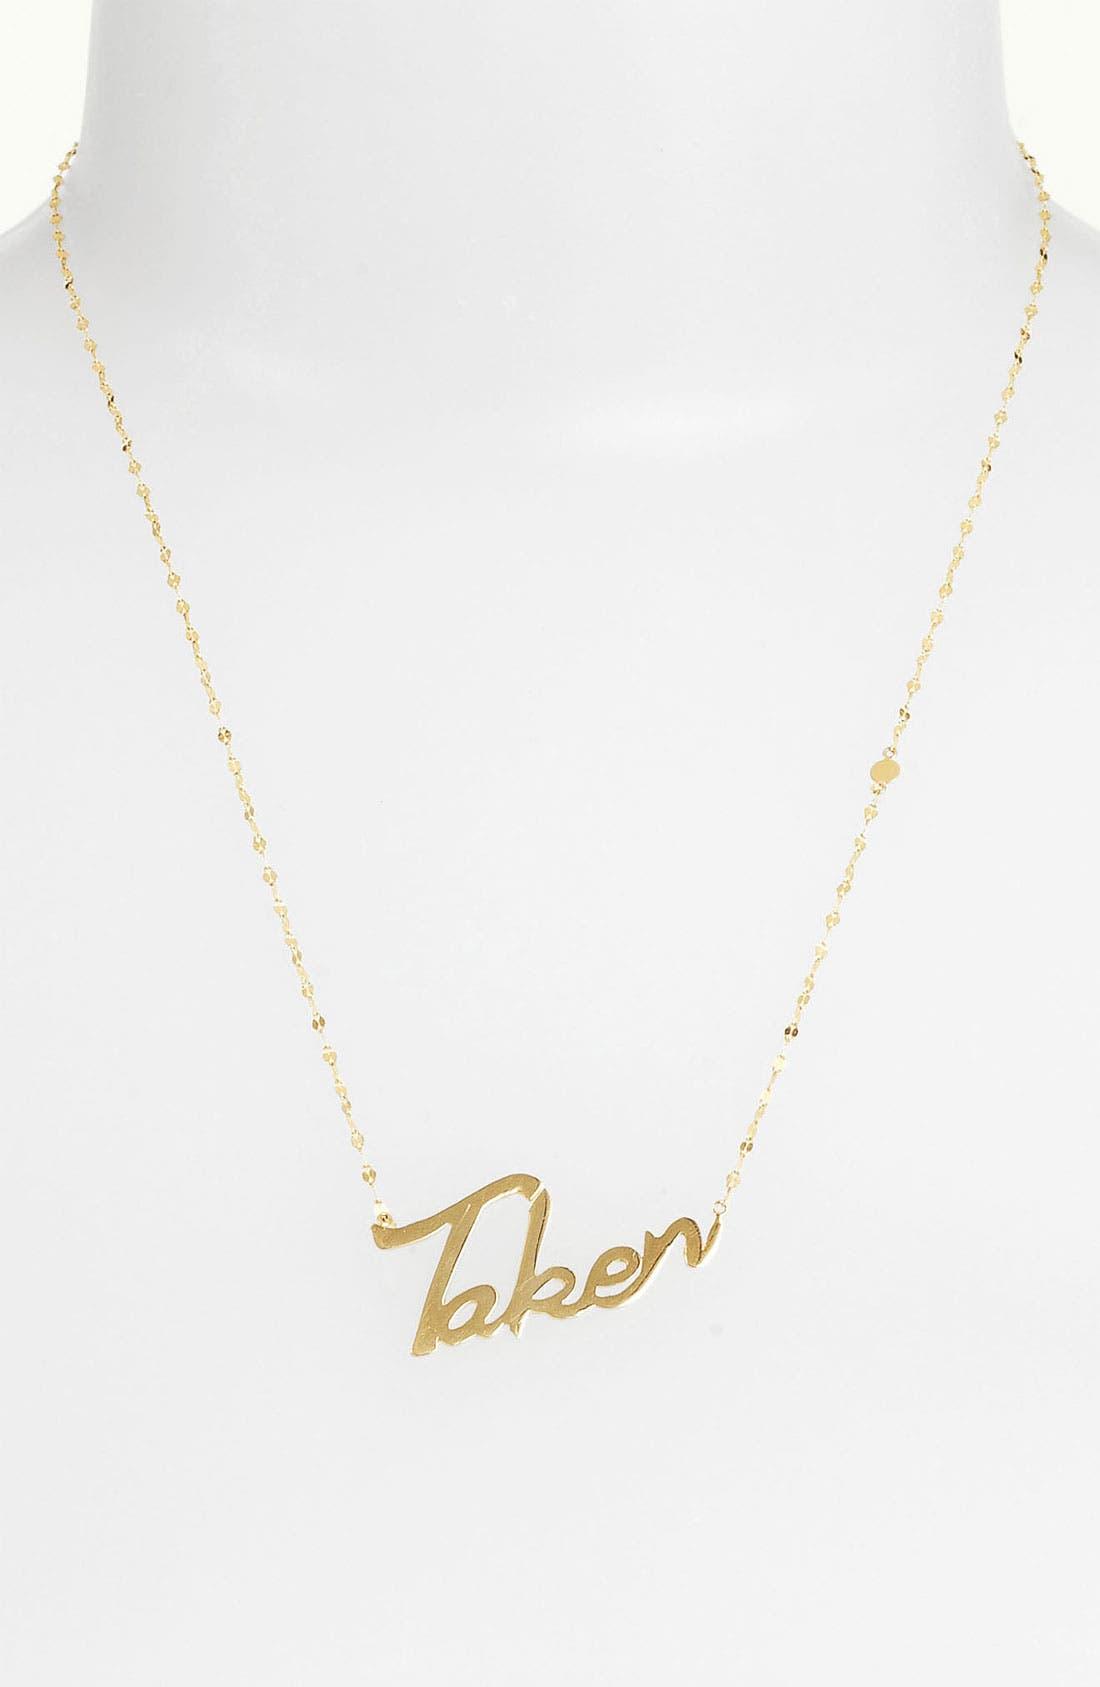 Main Image - Lana Jewelry 'Taken' Charm Necklace